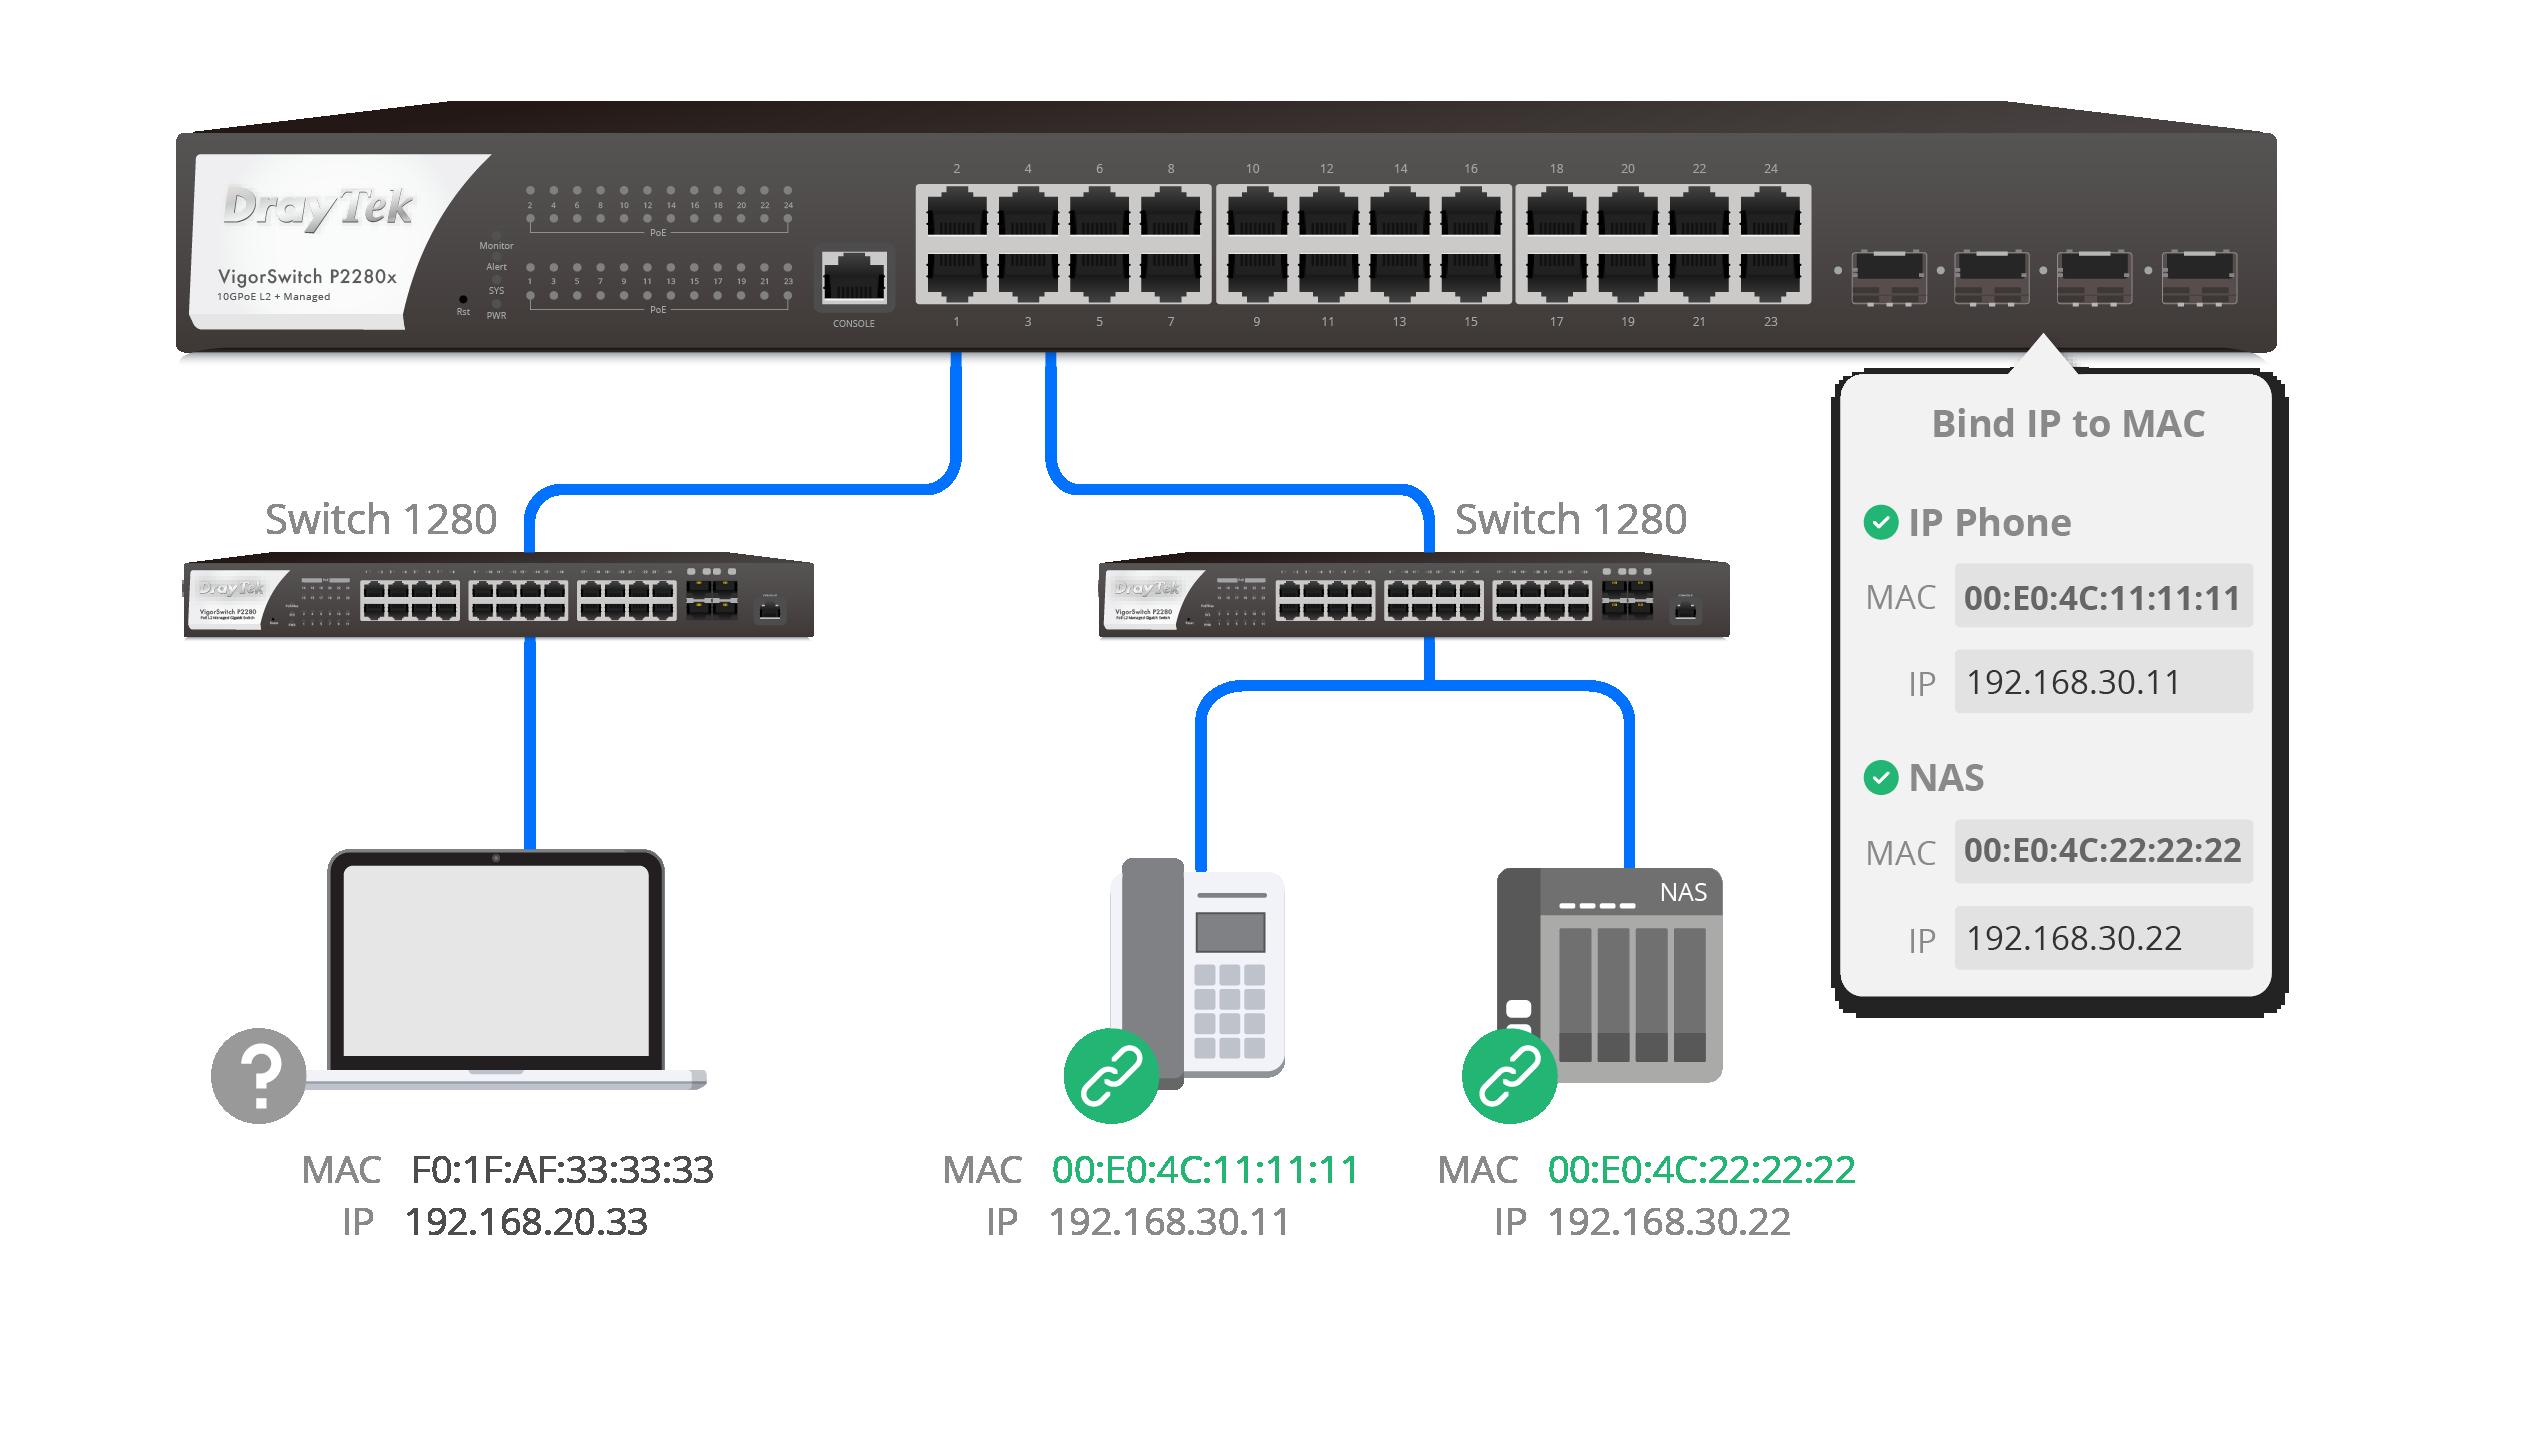 switch2280x-Bind IP to MAC-5.png